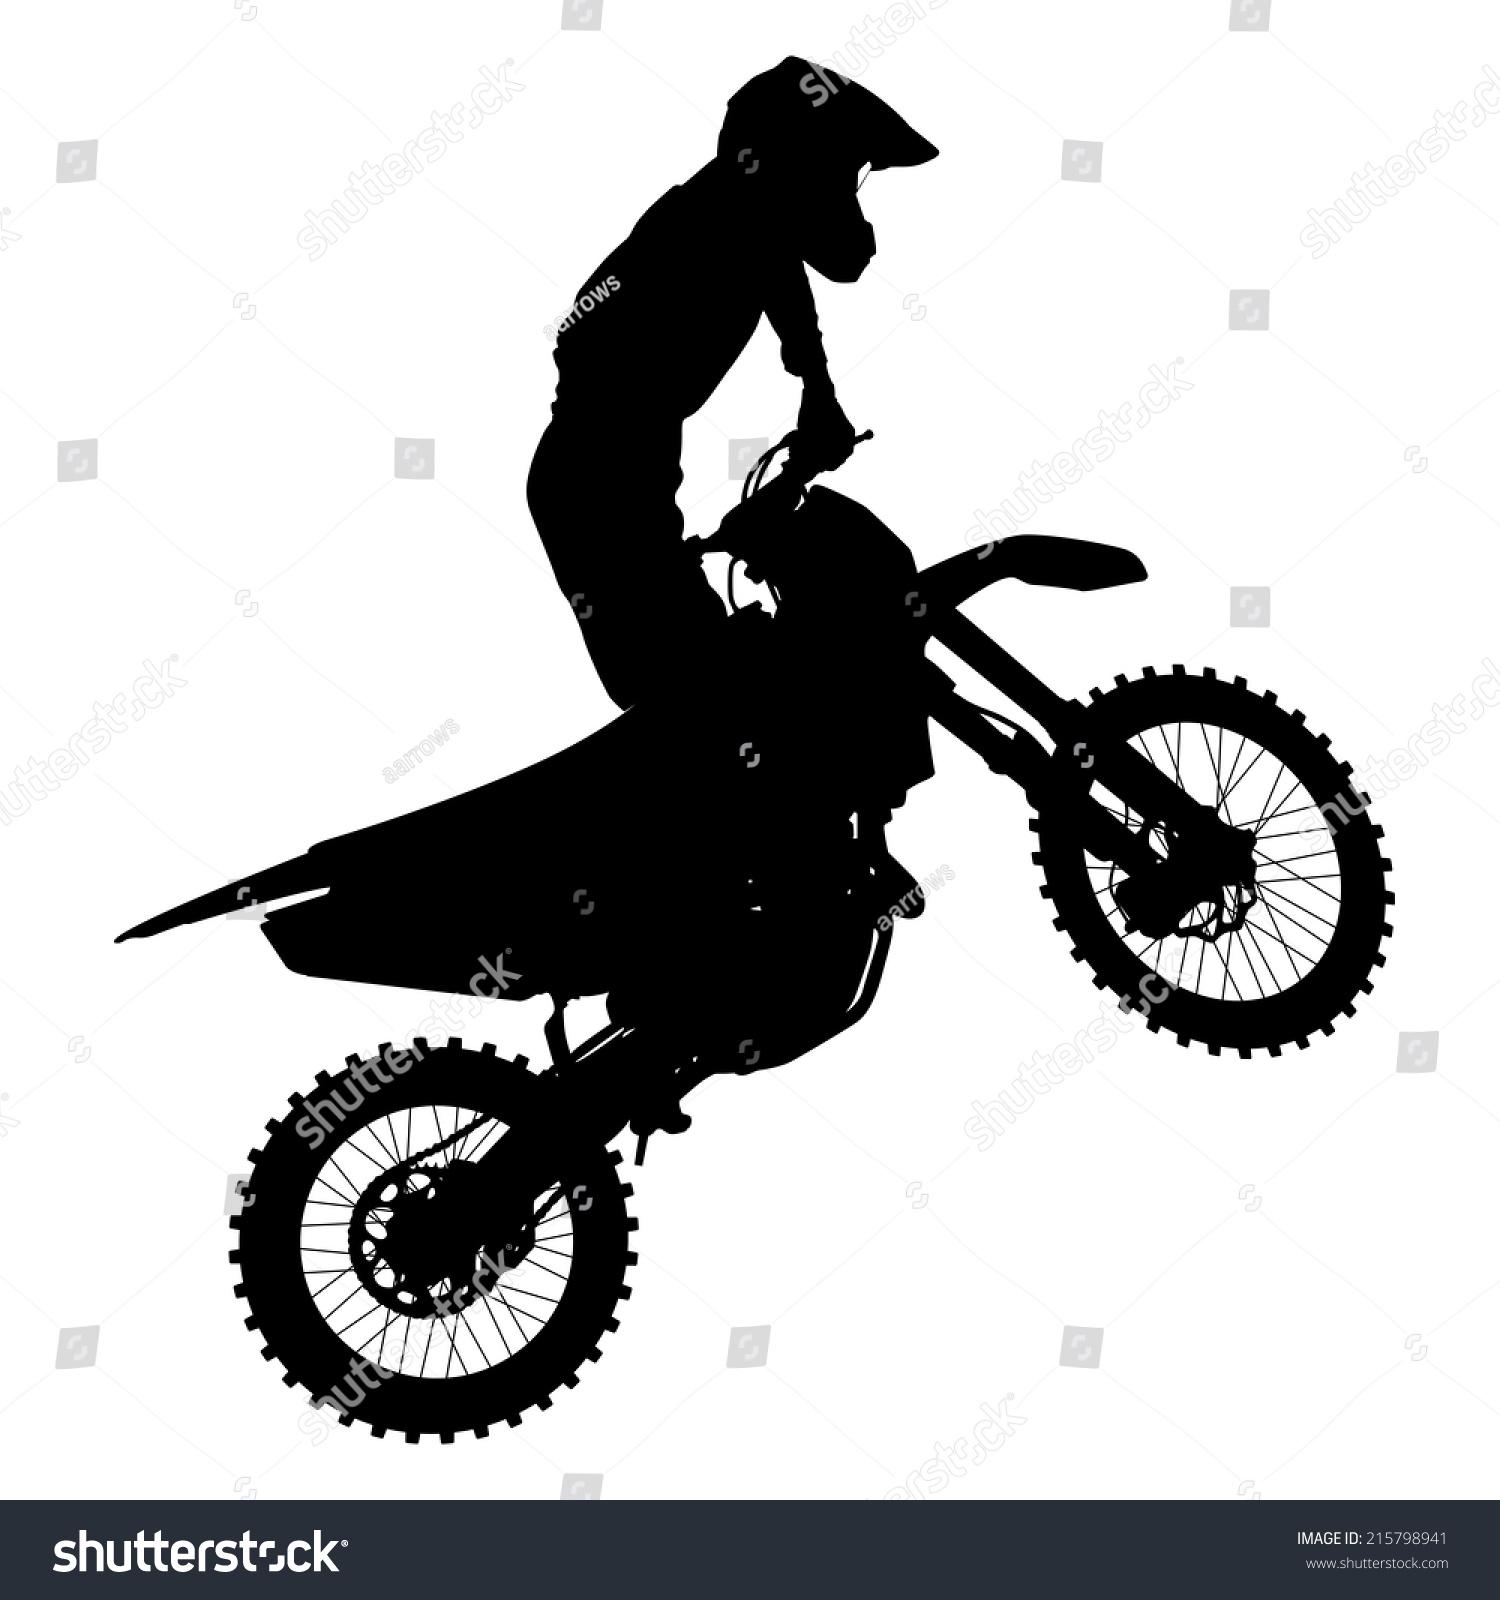 Vetor Stock De Black Silhouettes Motocross Rider On Motorcycle Livre De Direitos 215798941